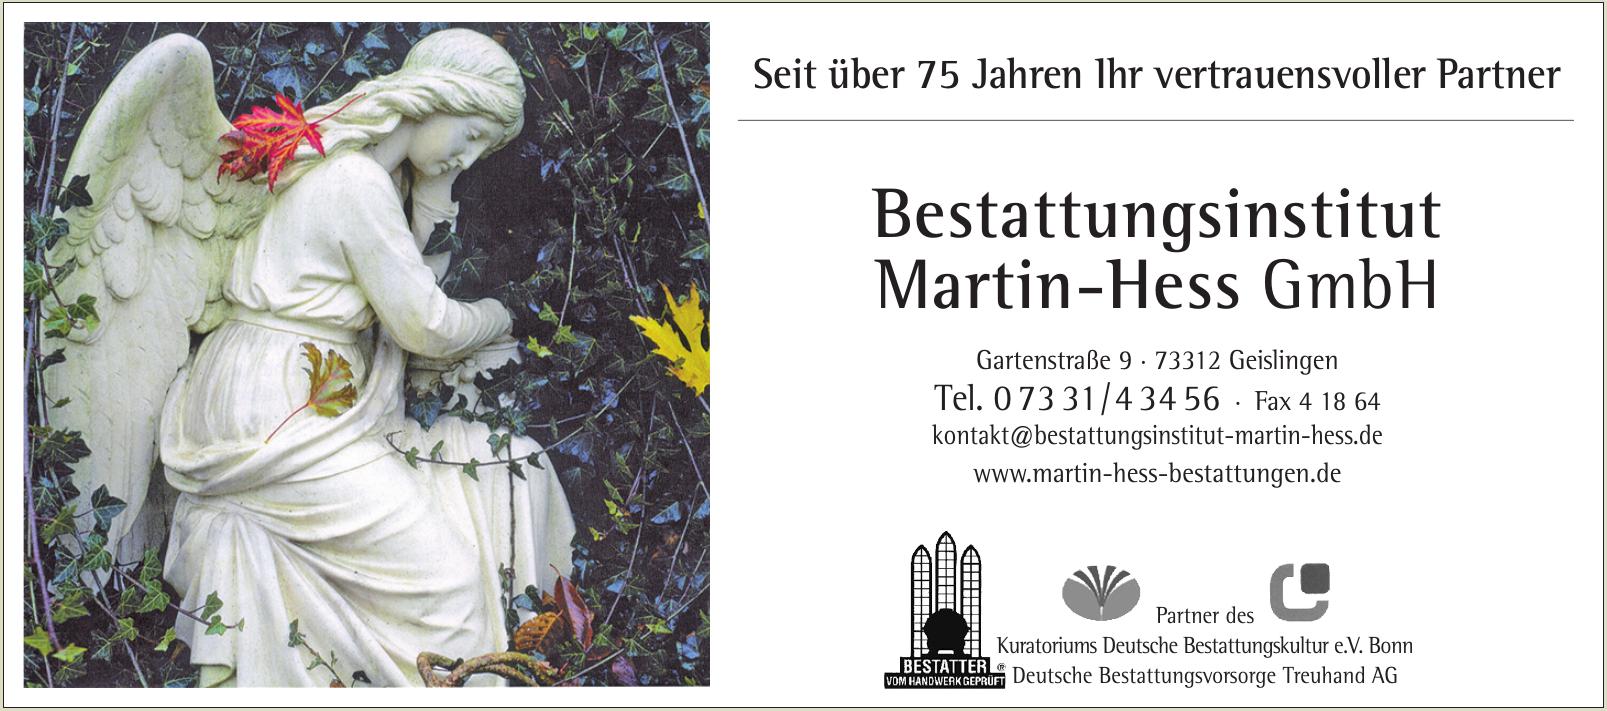 Bestattungsinstitut Martin-Hess GmbH